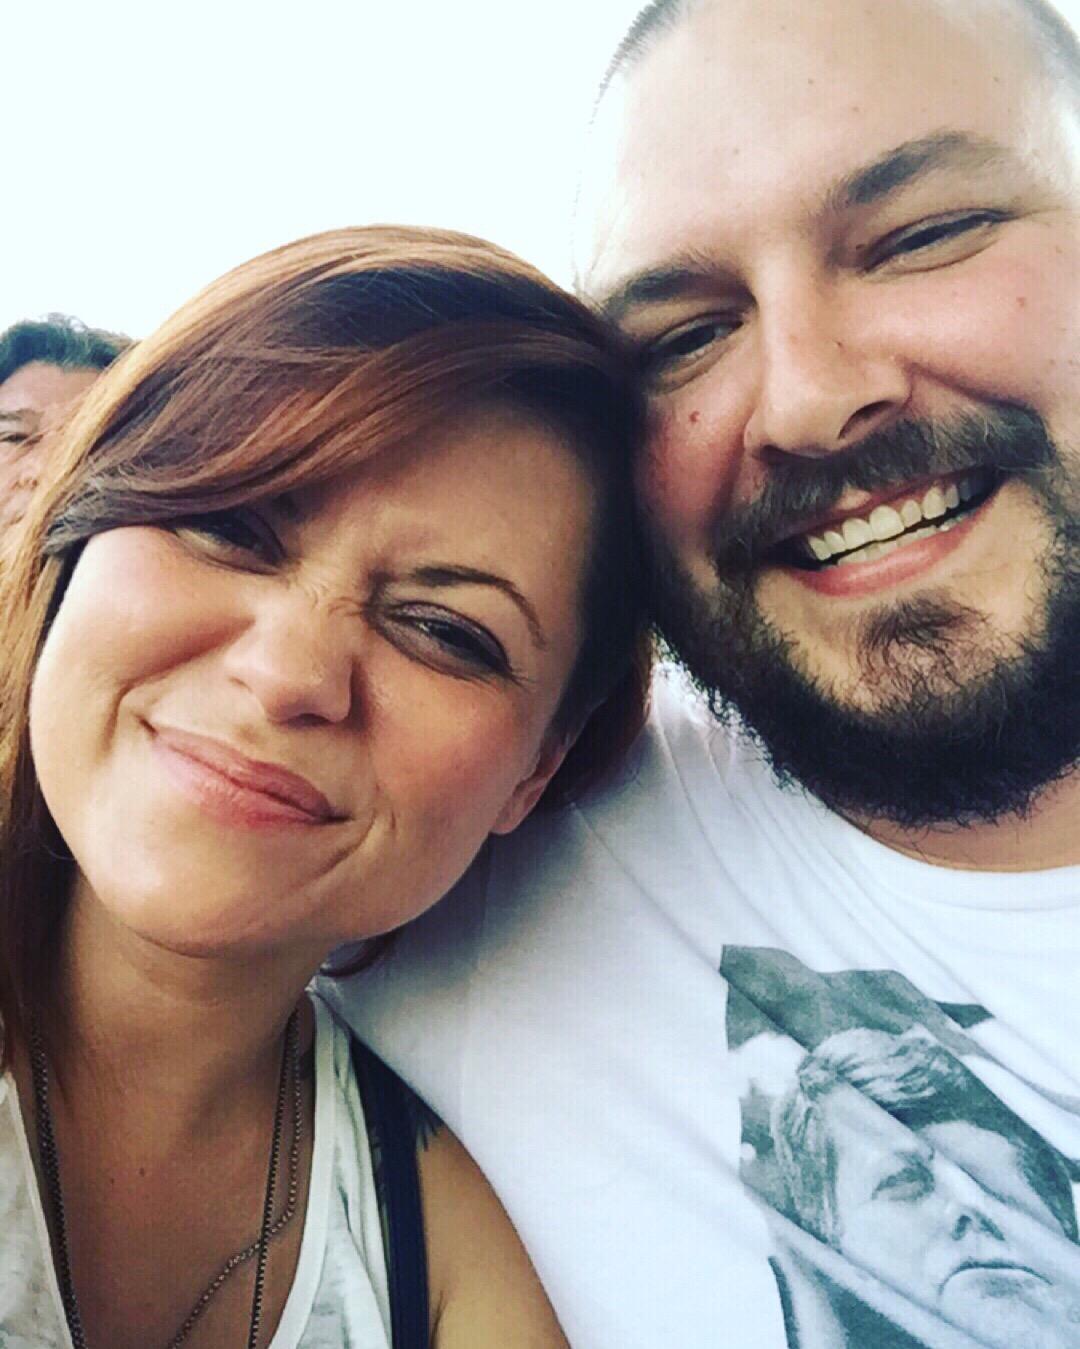 Teresa and Andrew - at Cris Stapelton concert in Tampa Florida